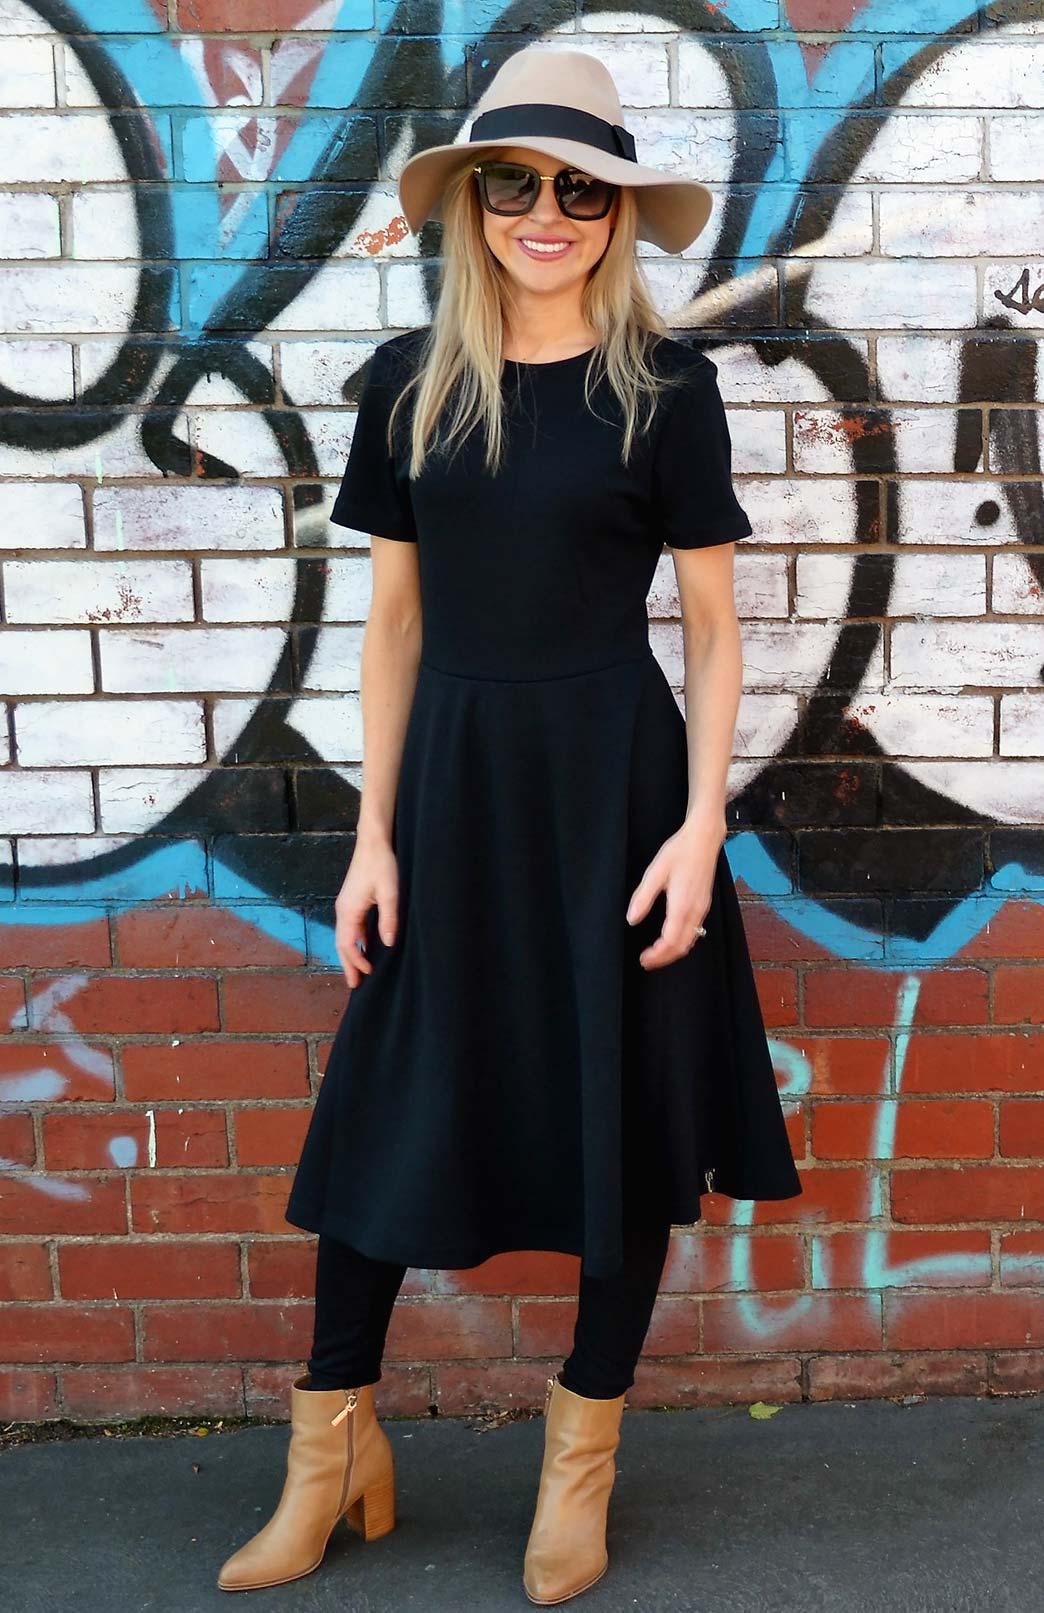 Zoe Dress - Women's Black Heavyweight Wool Short Sleeved Dress - Smitten Merino Tasmania Australia